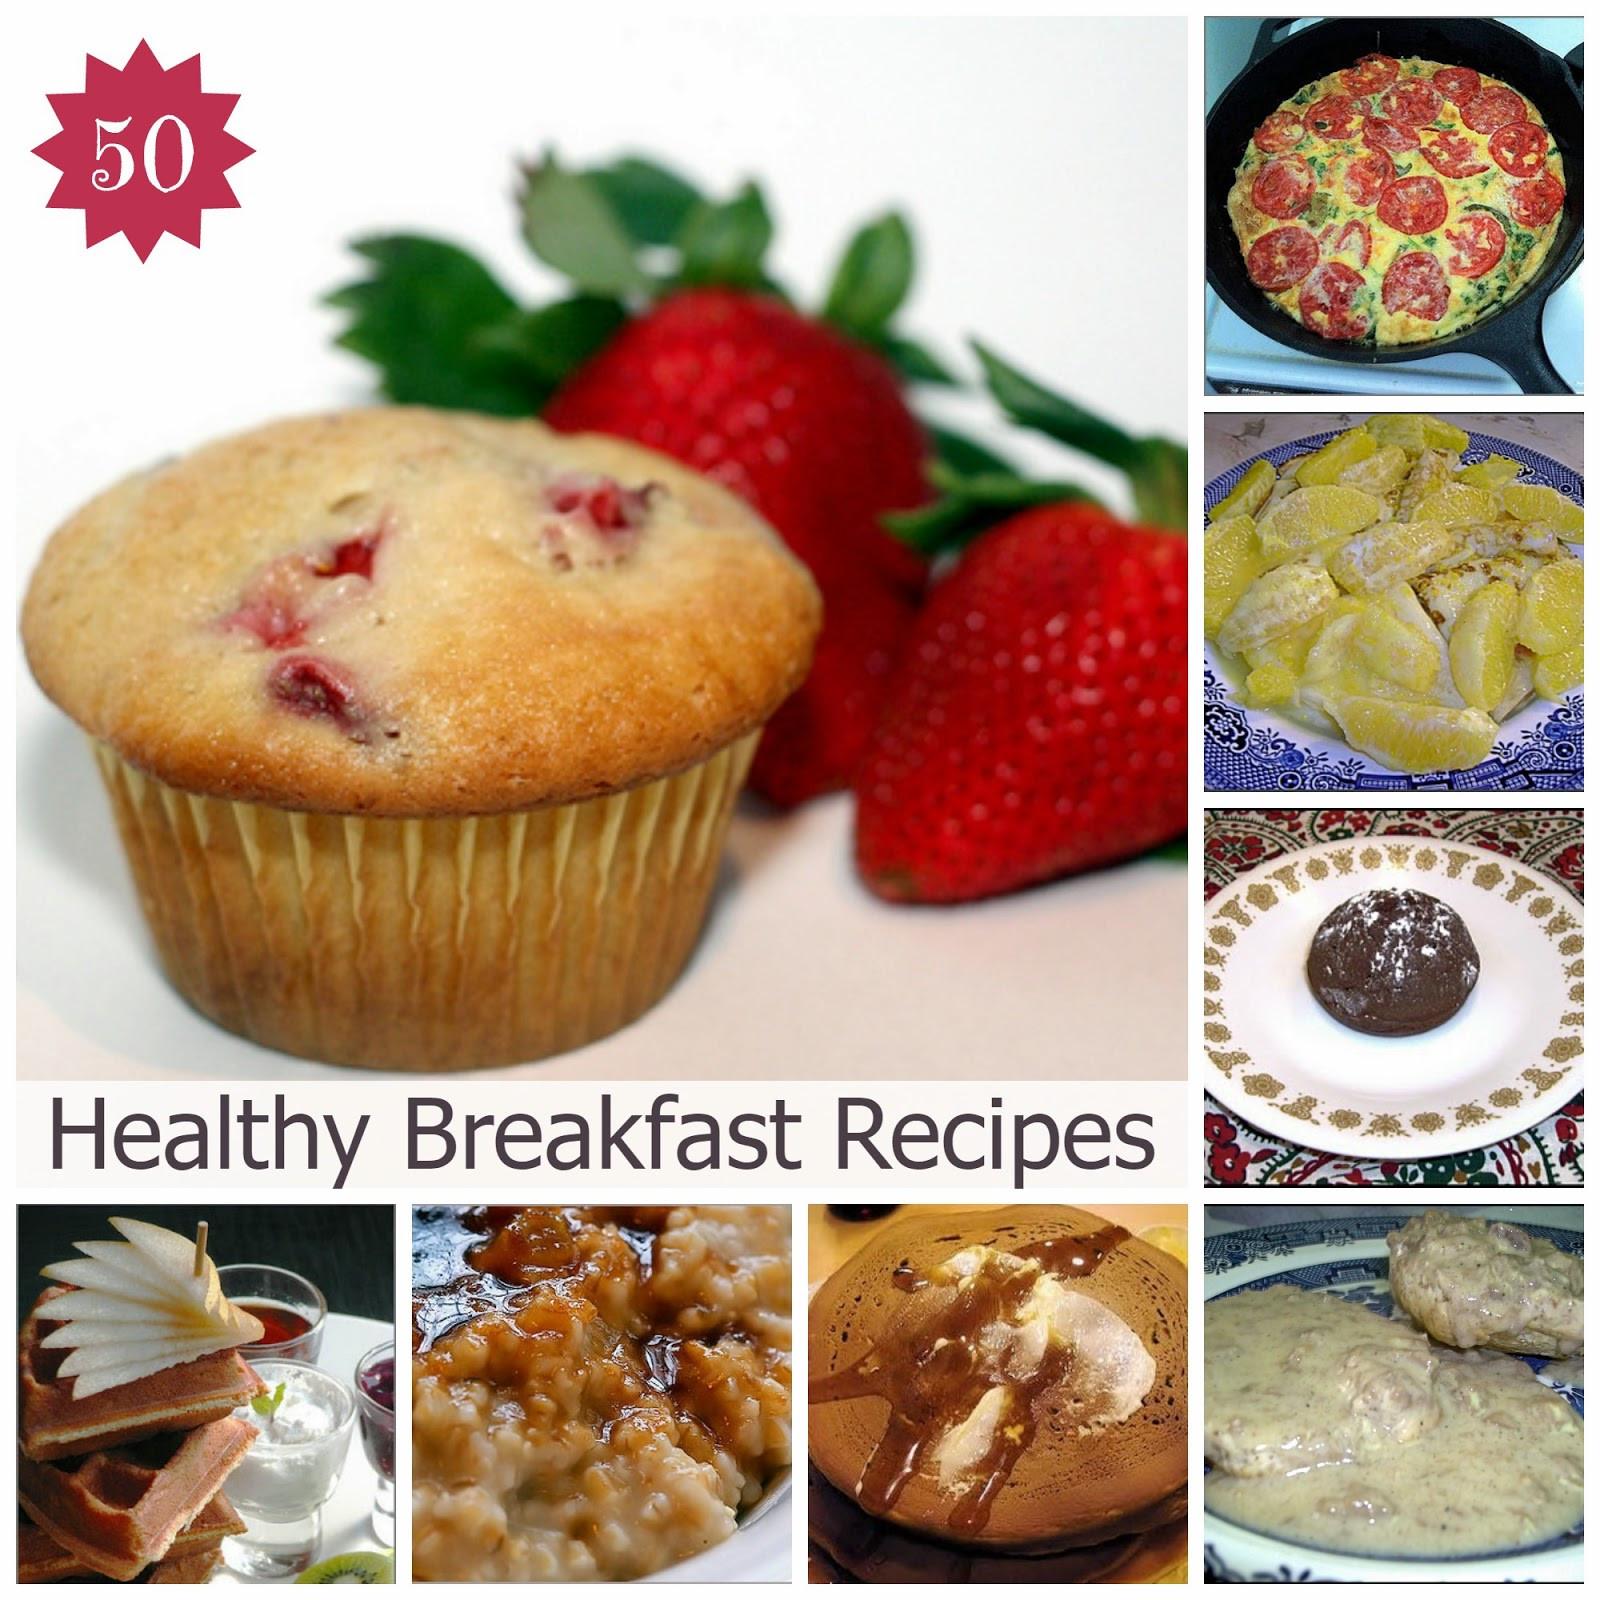 Healthy Breakfast Drinks Lose Weight  Becky Cooks Lightly 50 Healthy Breakfast Recipes To Lose